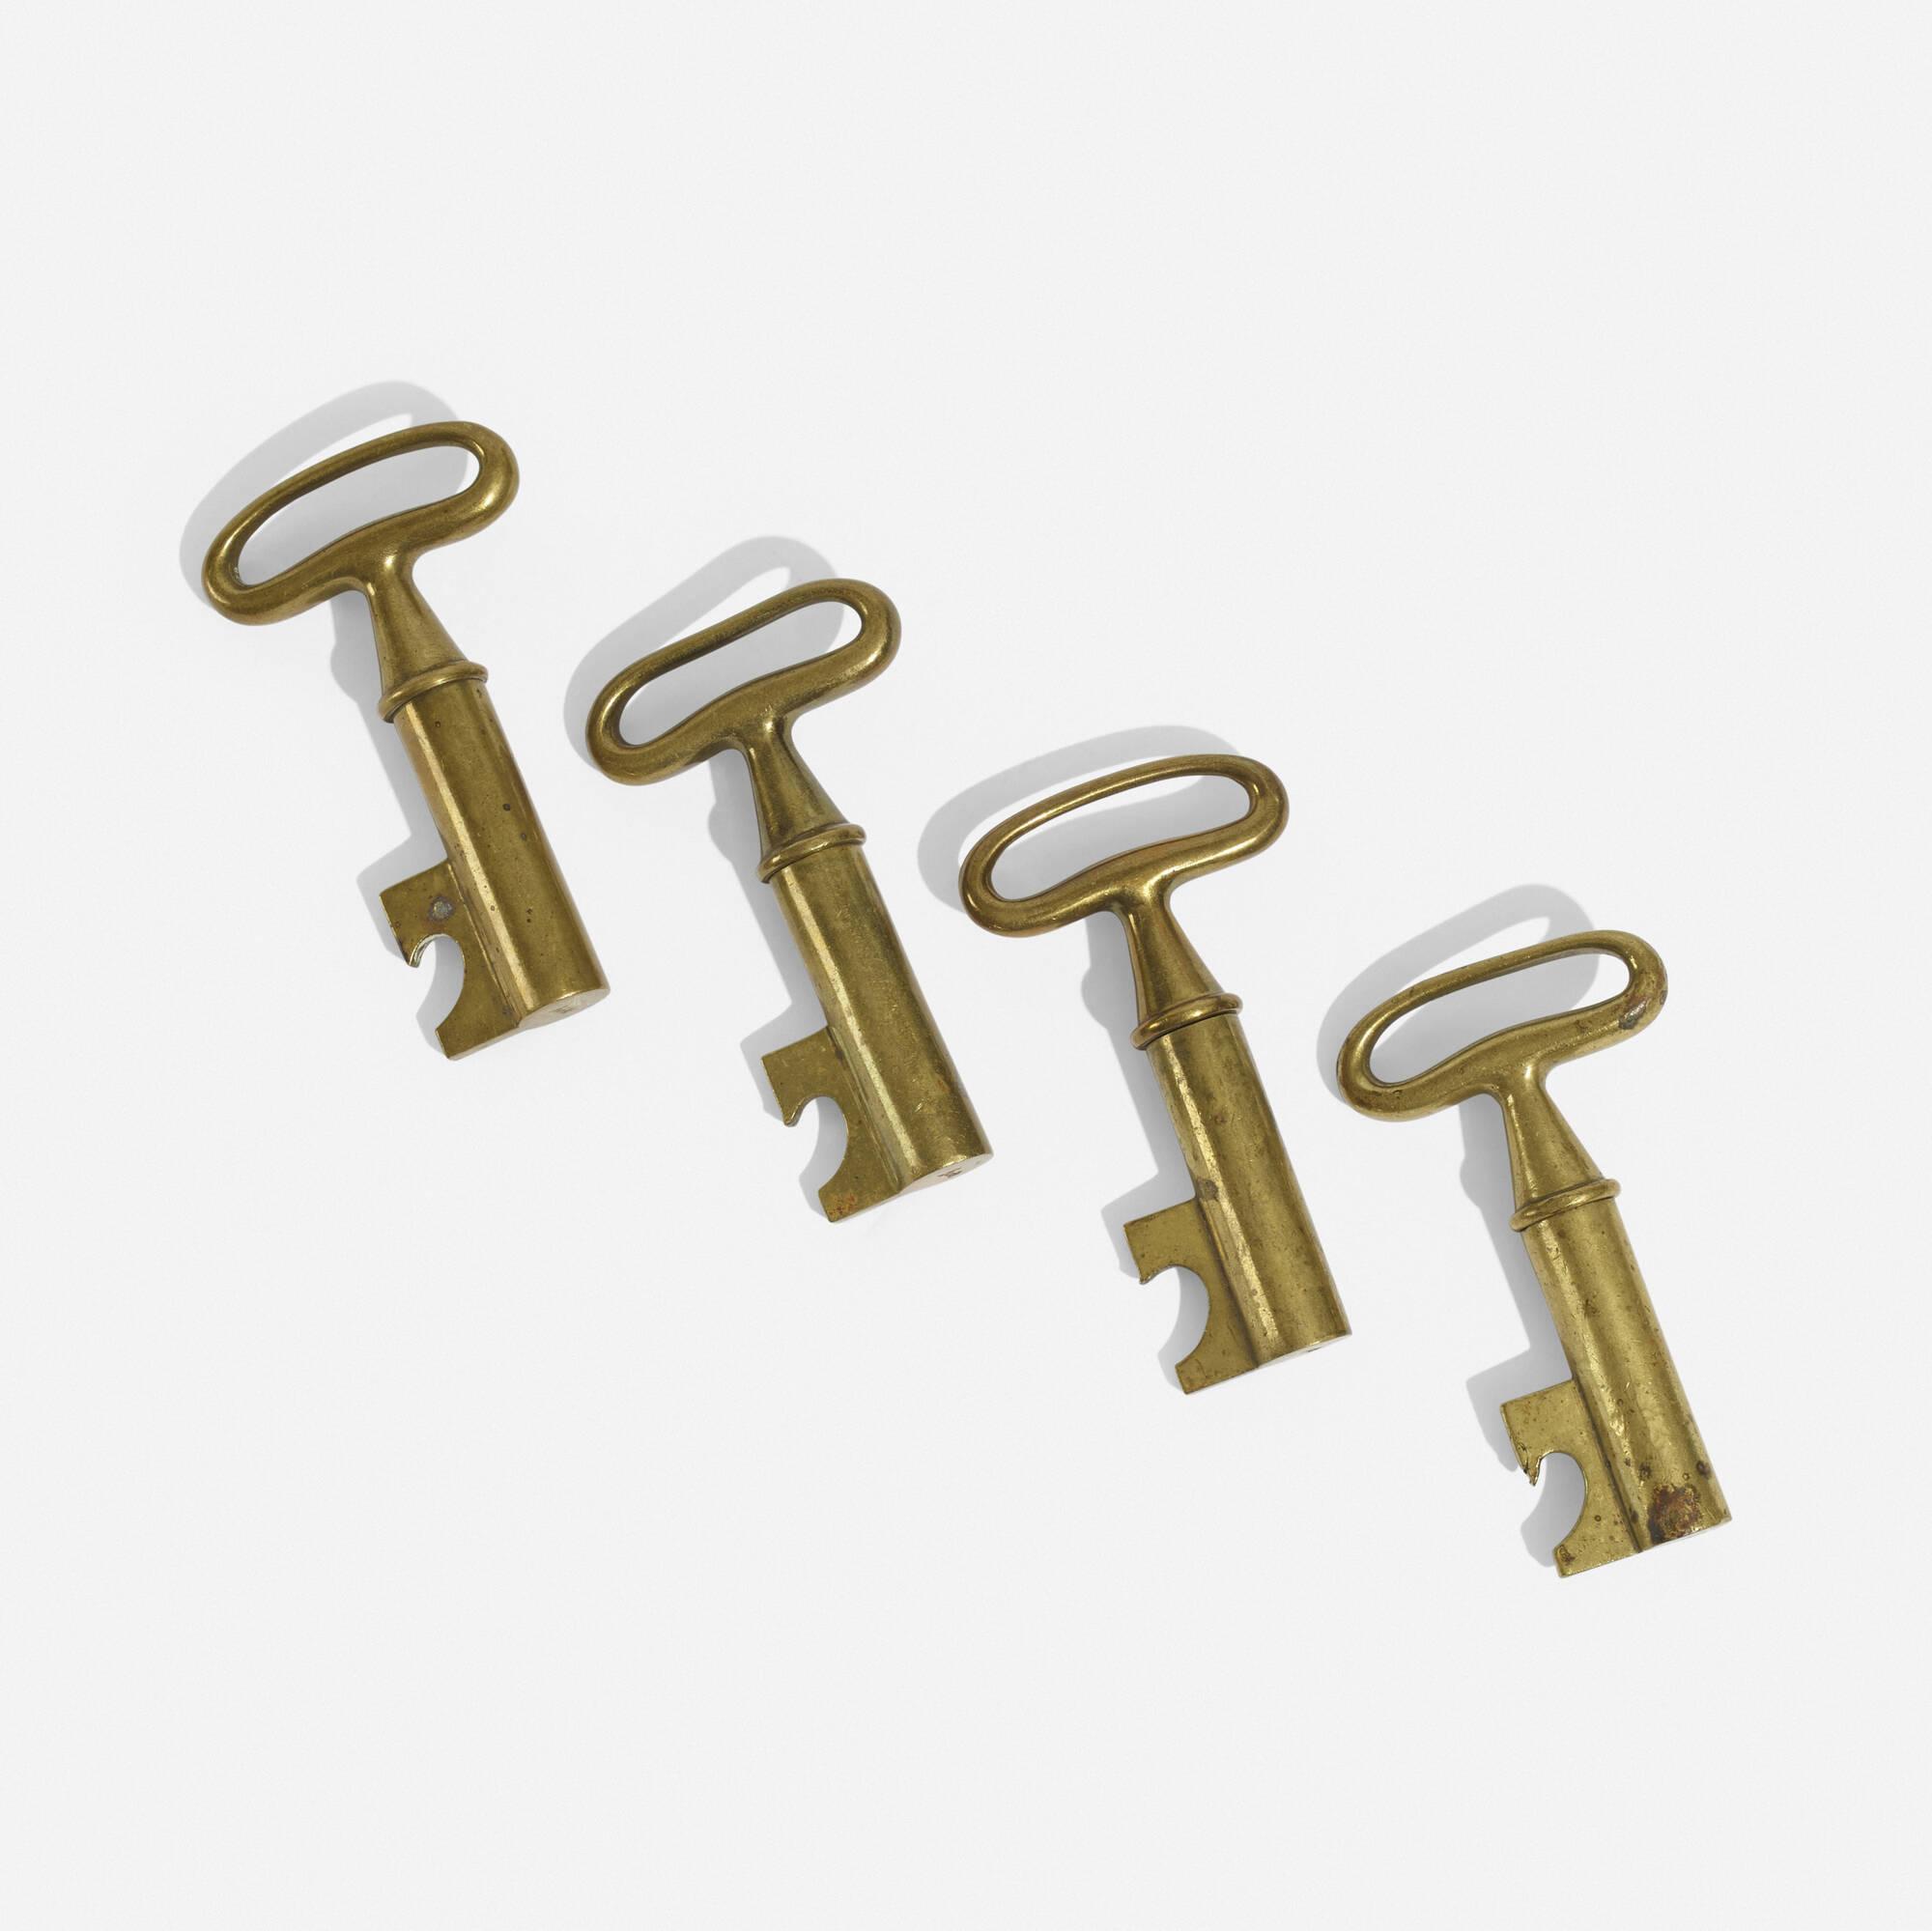 273: Carl Auböck II / corkscrews, set of four (1 of 4)